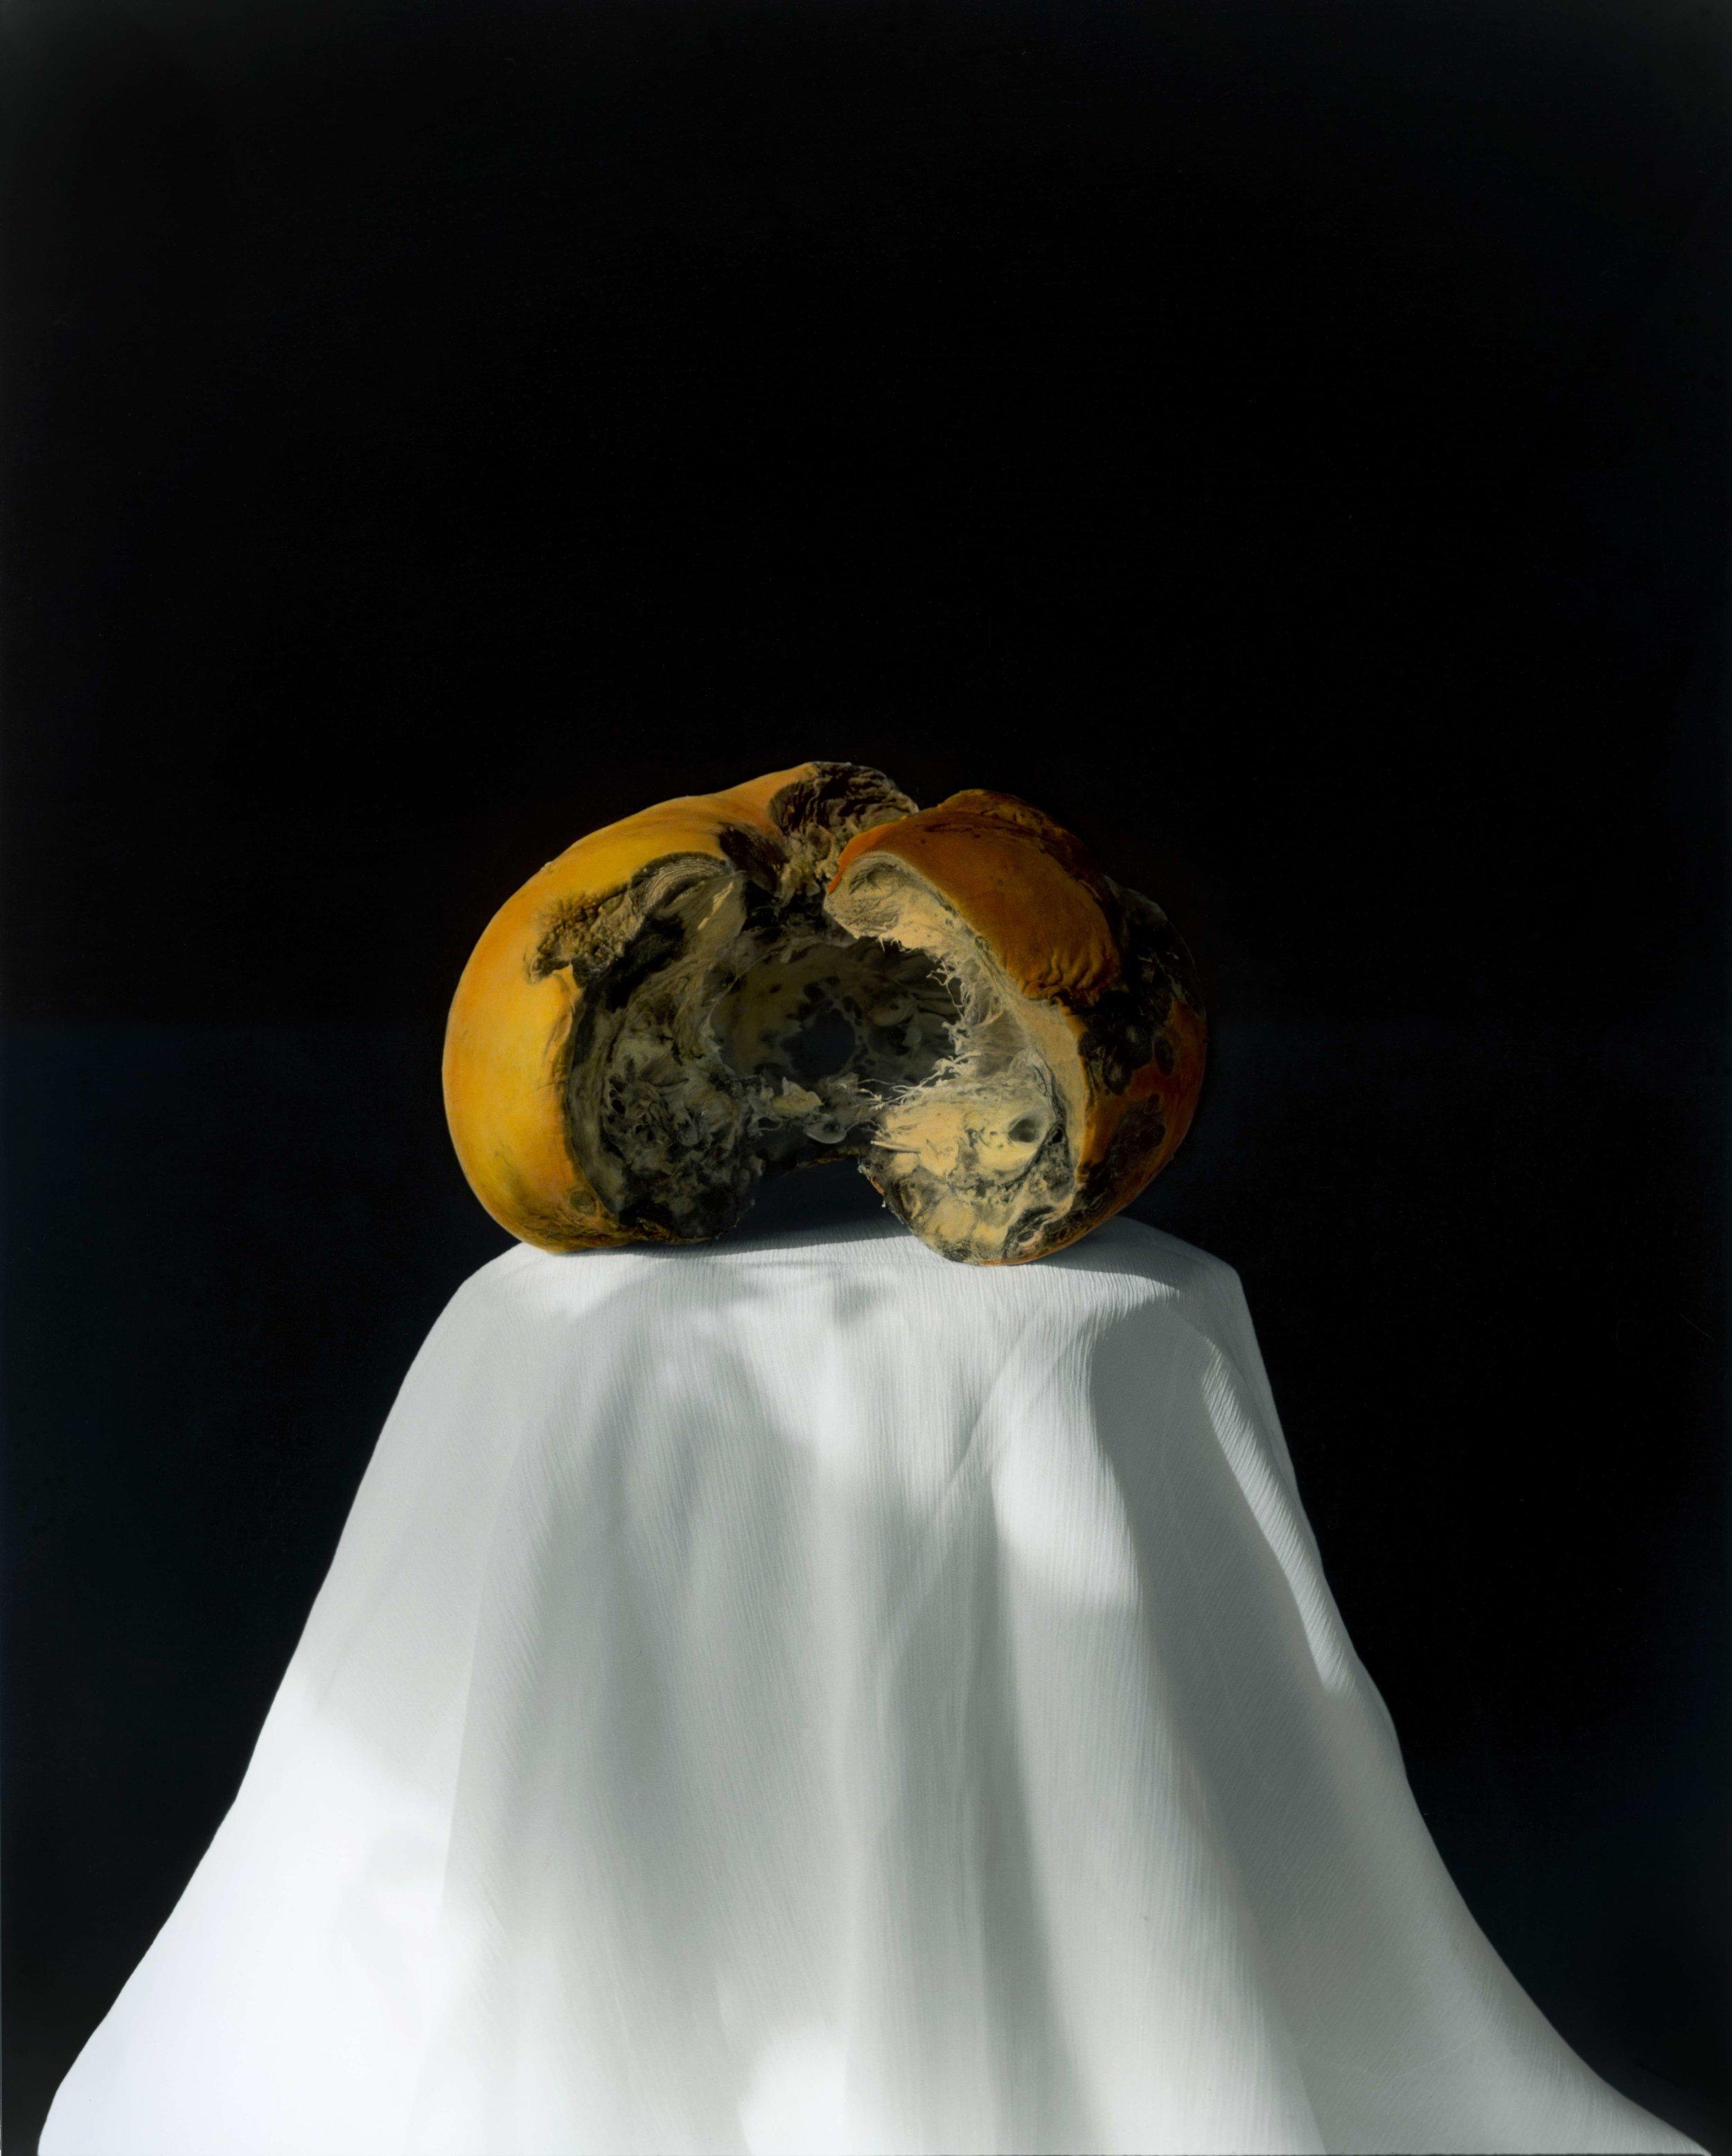 黄磊 南瓜 2008 (2-2)  明胶卤化银黑白照片,手工油彩着色 60.5×49.5 cm 2008  Huang Lei, Pumpkin 2008 (2-2), hand dyed with oil colour on gelatin silver print_compressed.jpg